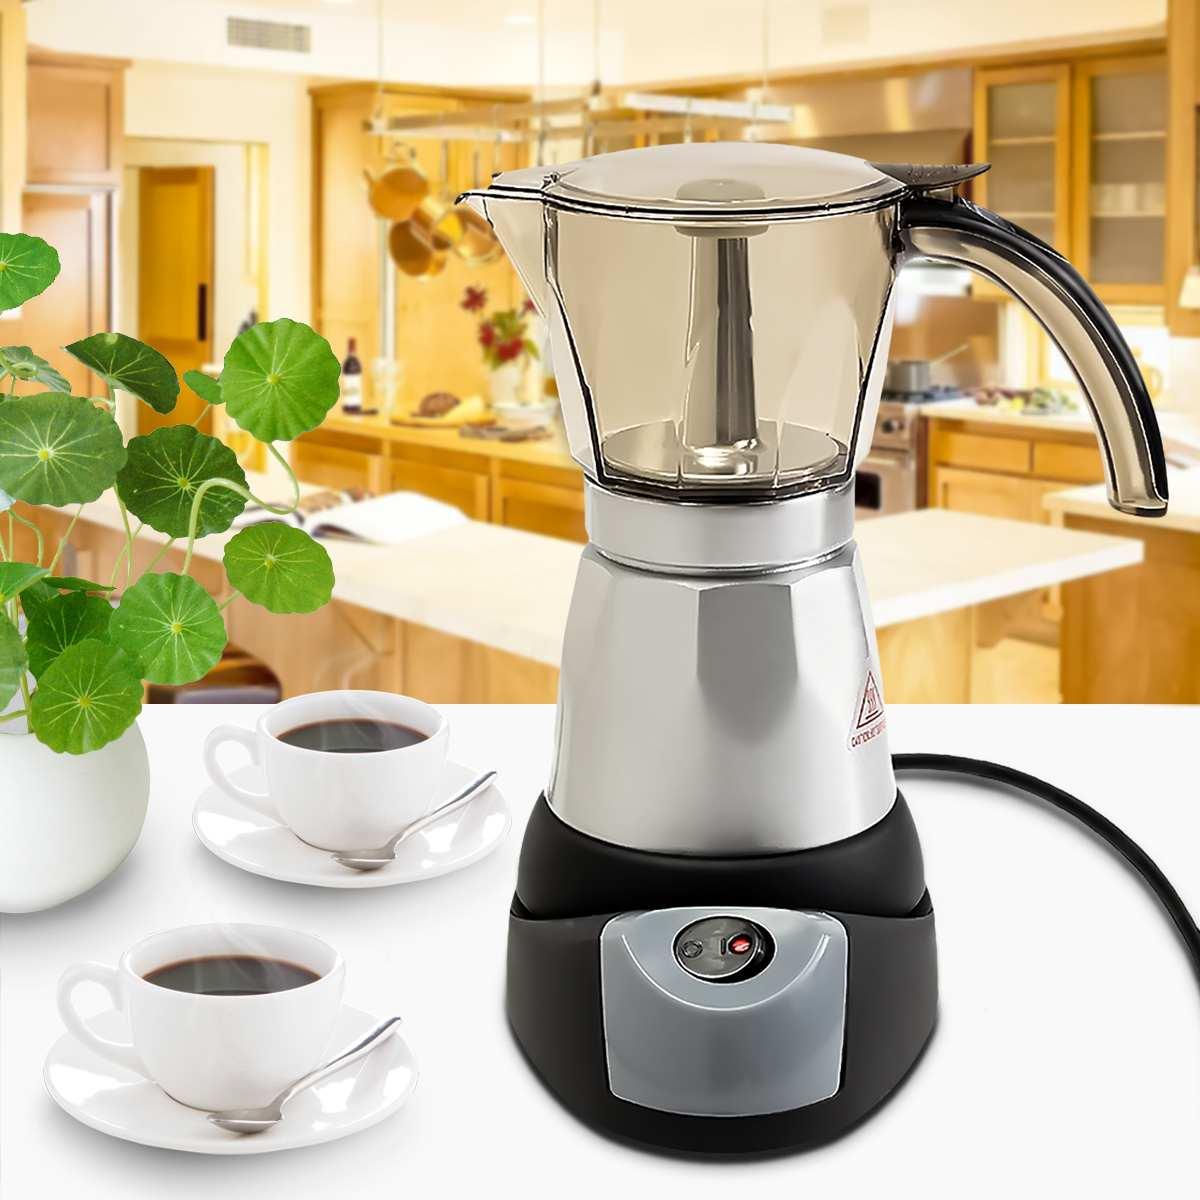 300ml Electric Automatic Coffee Machine Mini Coffee Maker Kitchen Cafetiere Heater 6 Cups 3 minutes AU Plug 220-240V Tea Pot